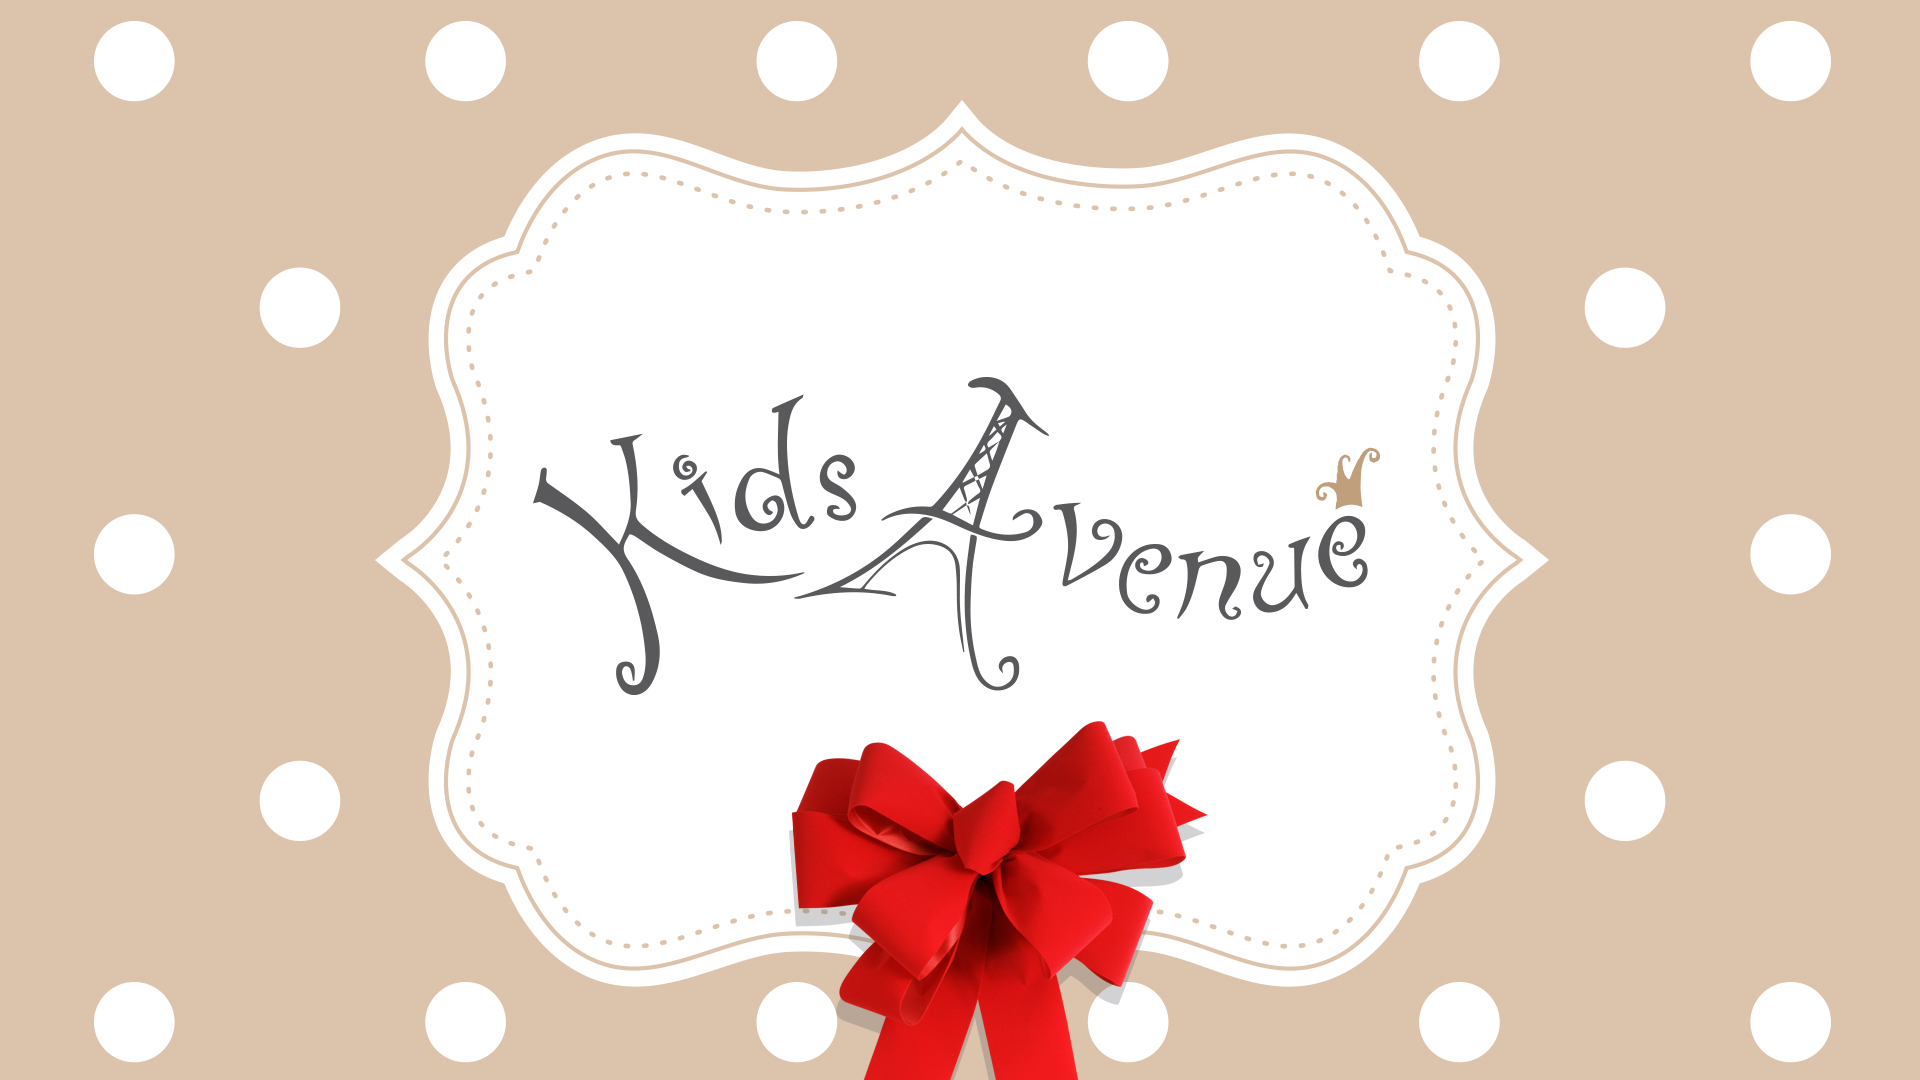 Kids-Avenue-1920x1080(1)